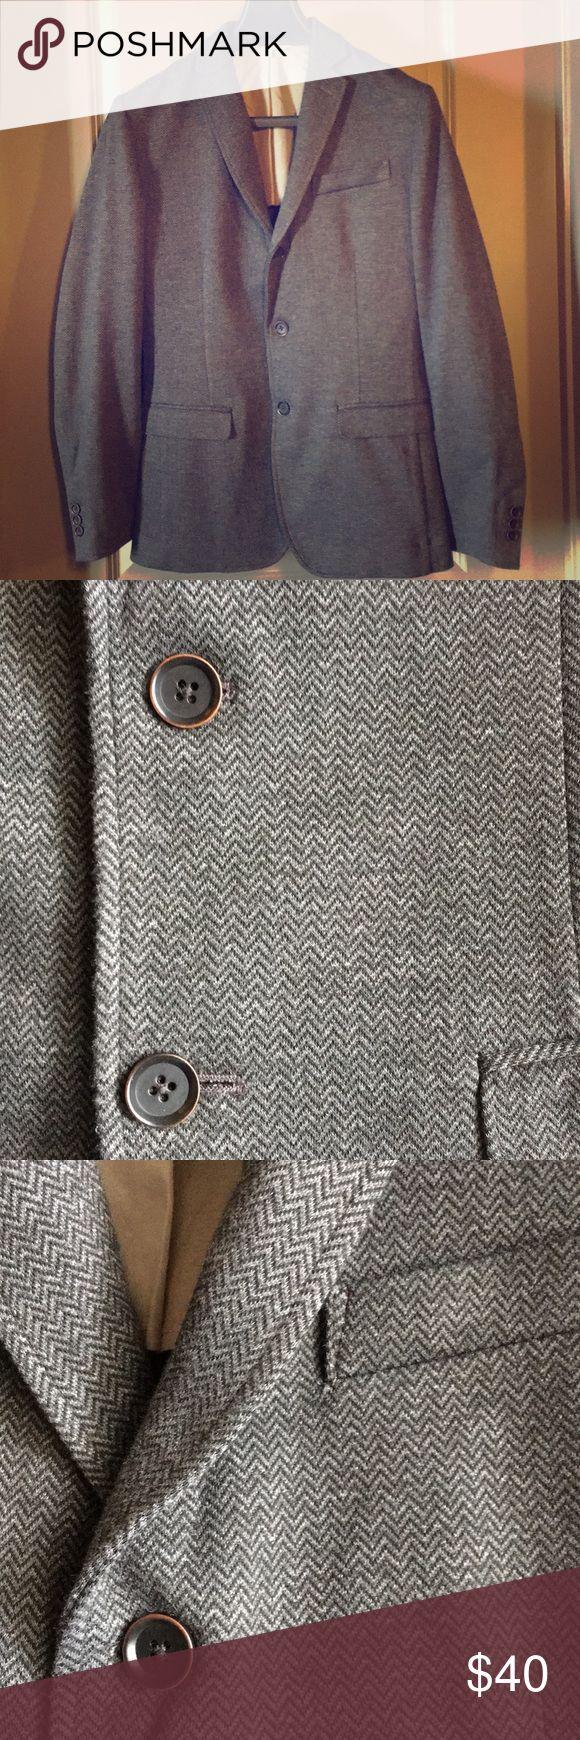 Mens sport coat Grey herringbone sport coat, shell is polyester rayon spandex blend, half lined, soft shoulders, 3 buttons, a lightweight casual sport coat Banana Republic Suits & Blazers Sport Coats & Blazers